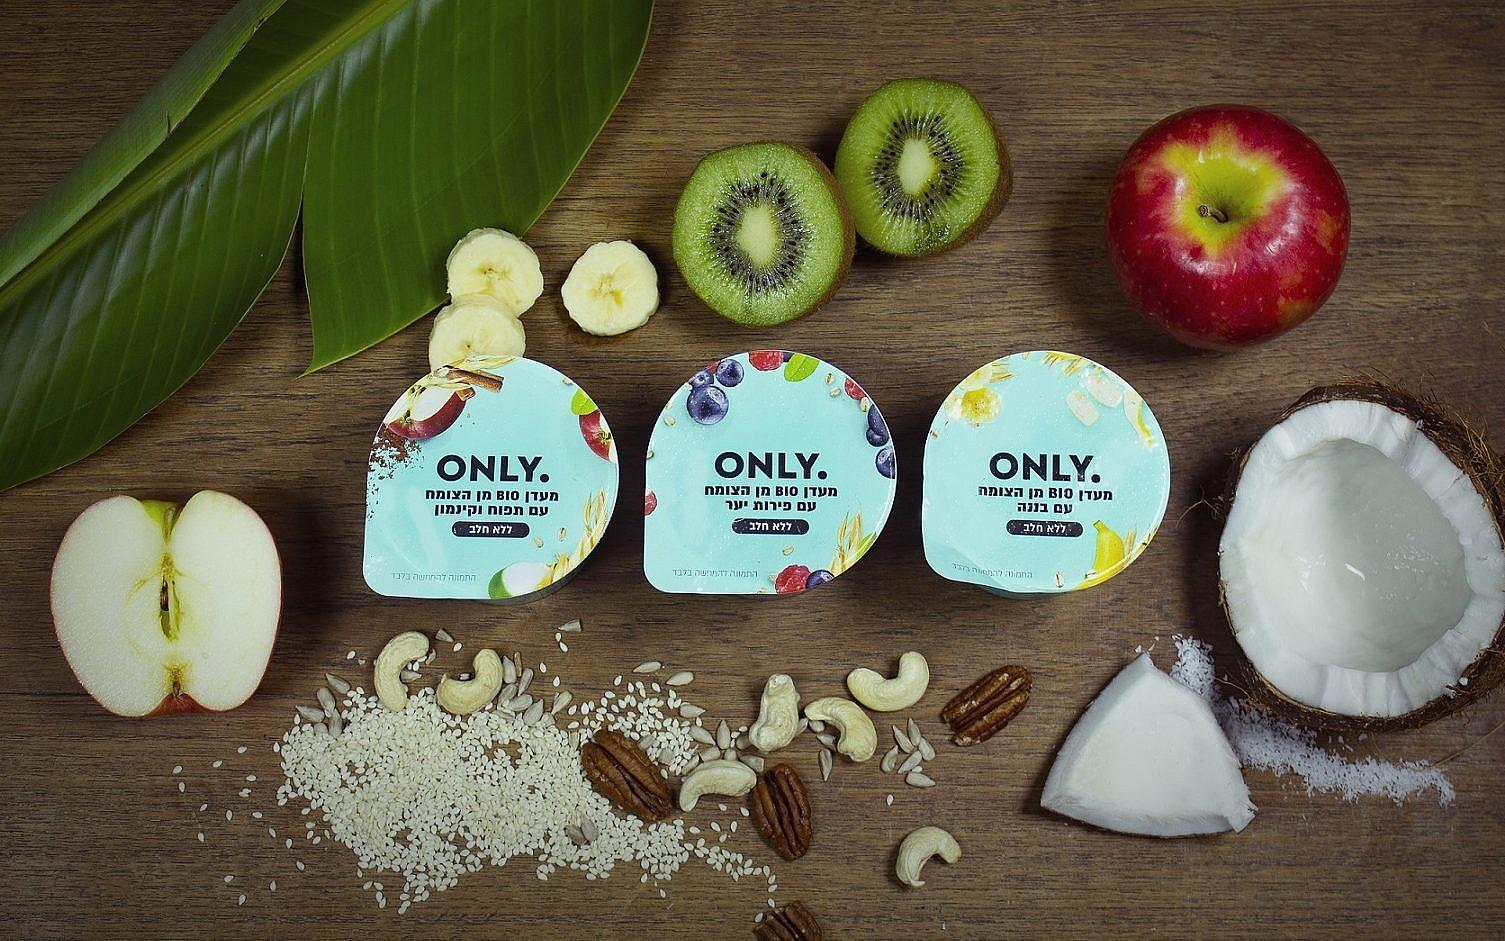 Best Yogurt For Probiotics 2020 Beyond nut and coconut milk: Vegan yogurt ferments grains, seeds